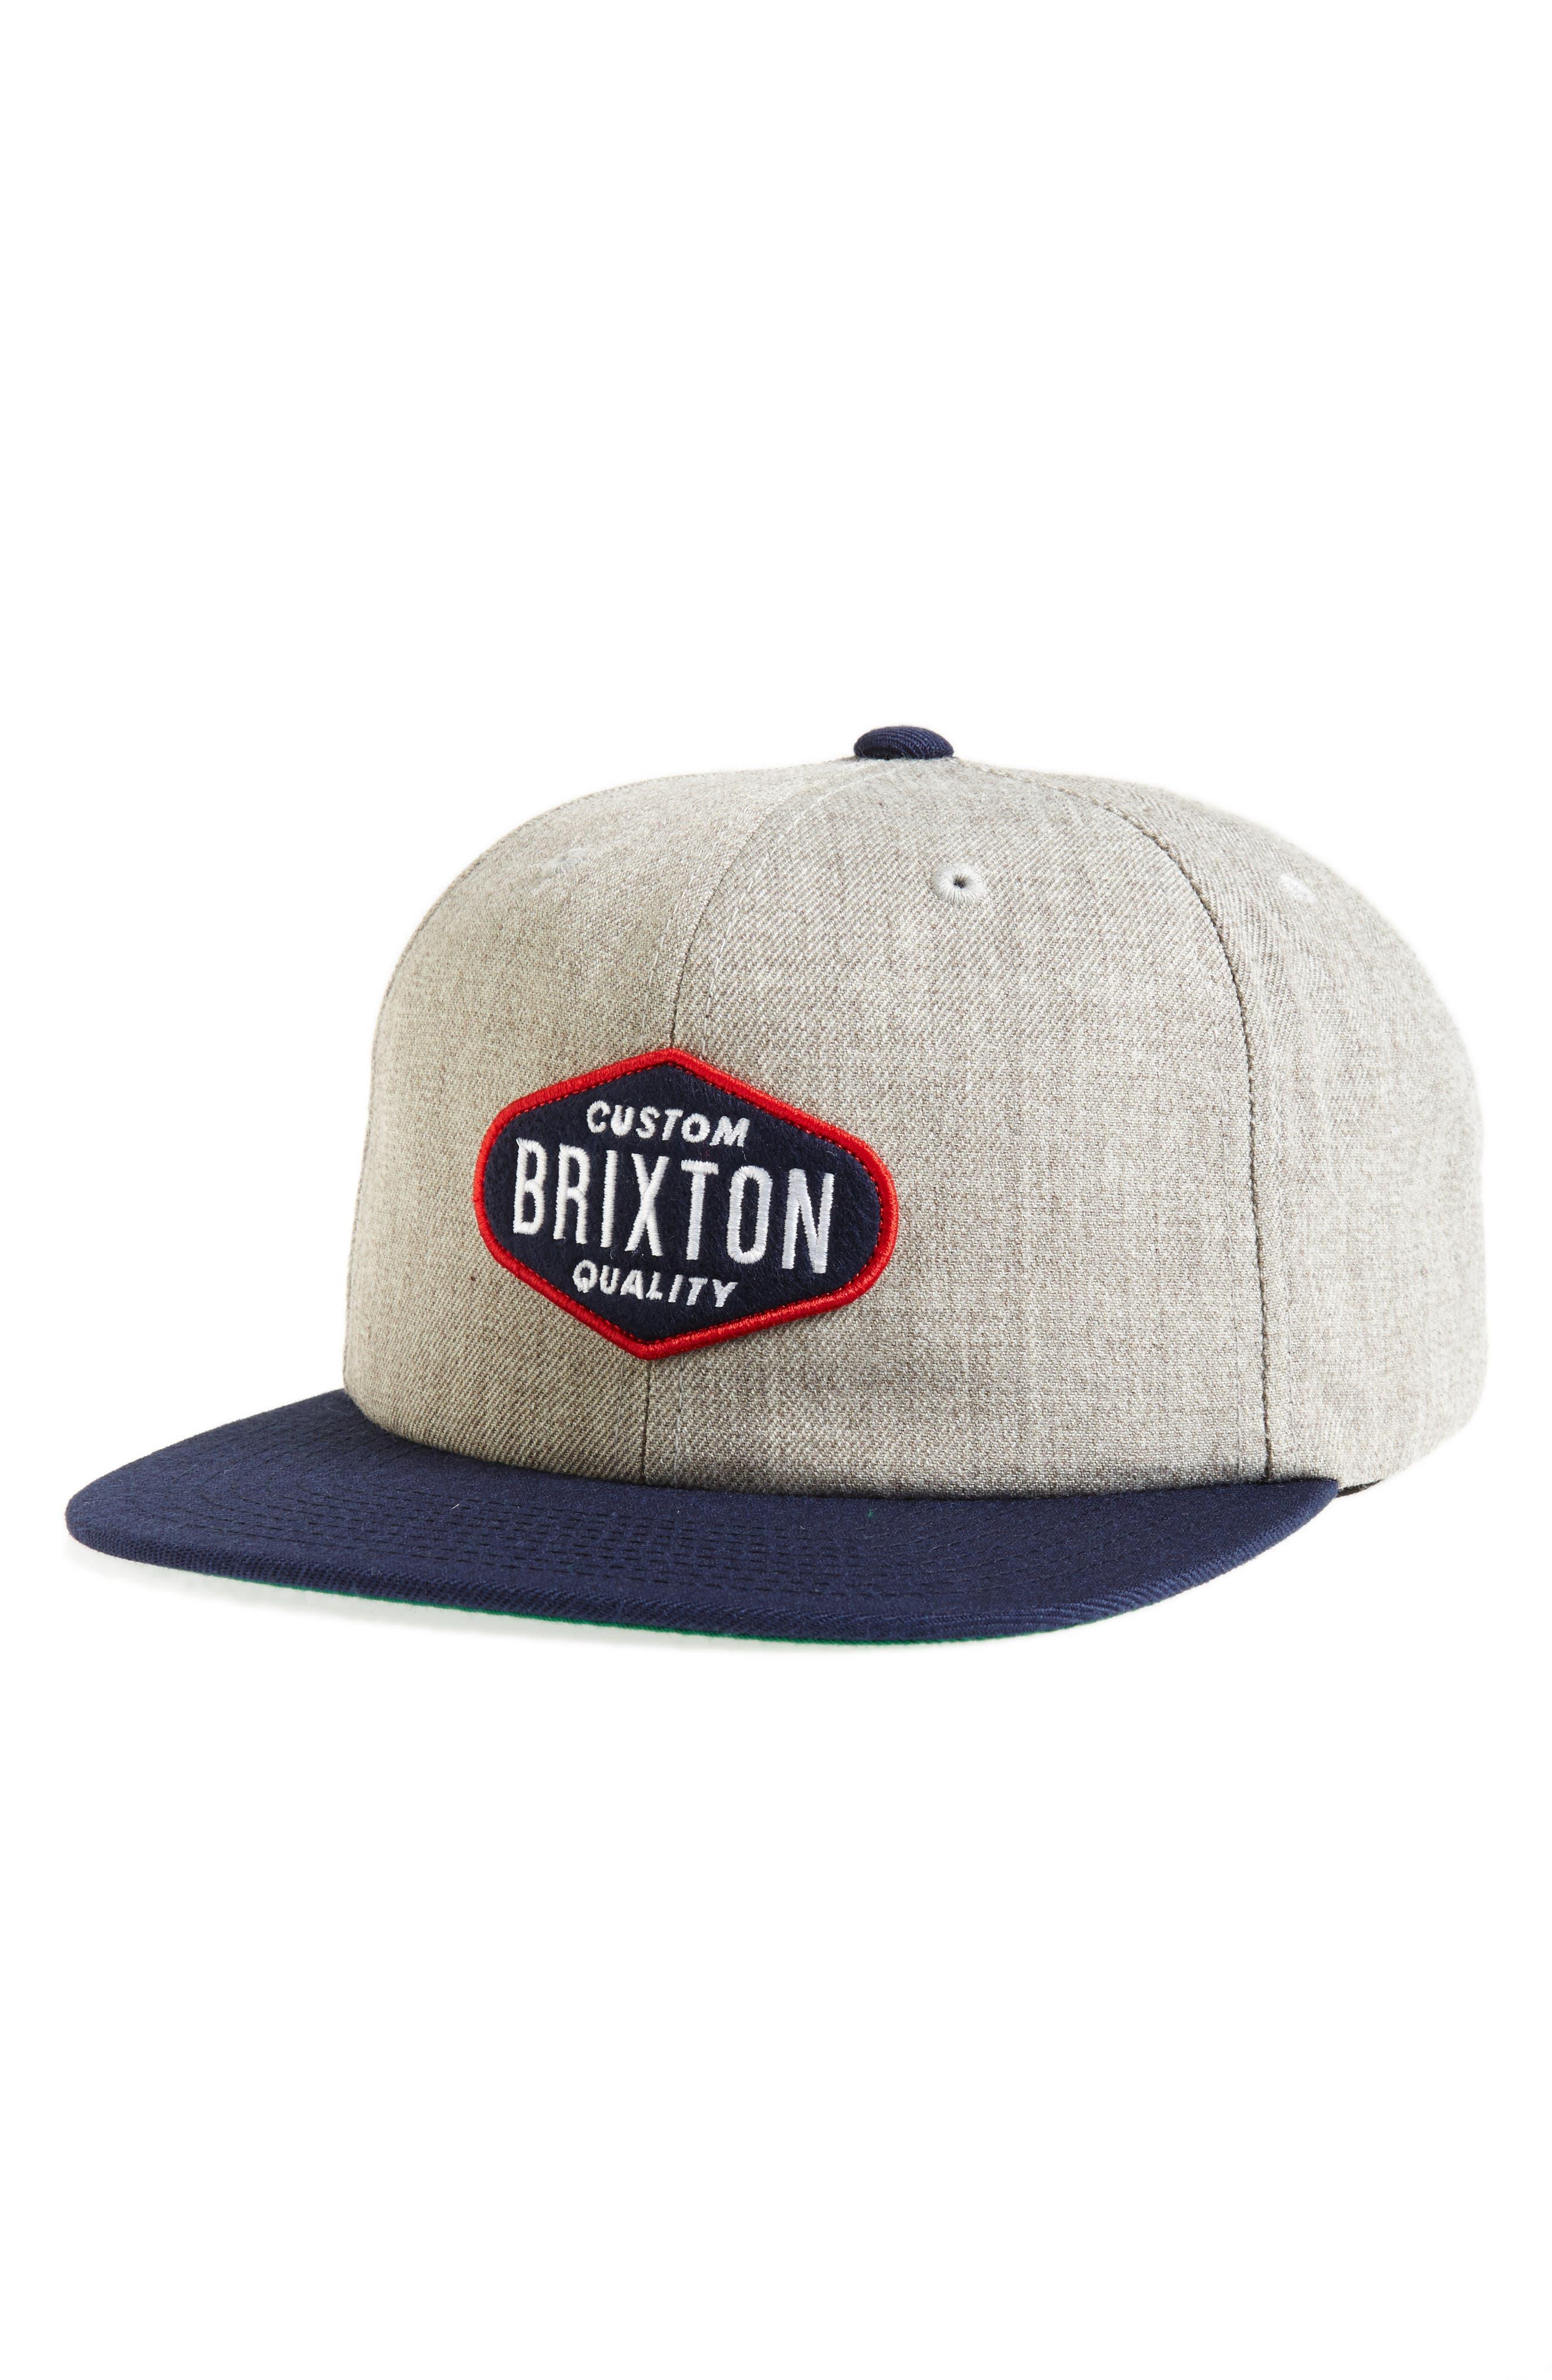 Oakland Snapback Cap,                         Main,                         color, Light Heather Grey